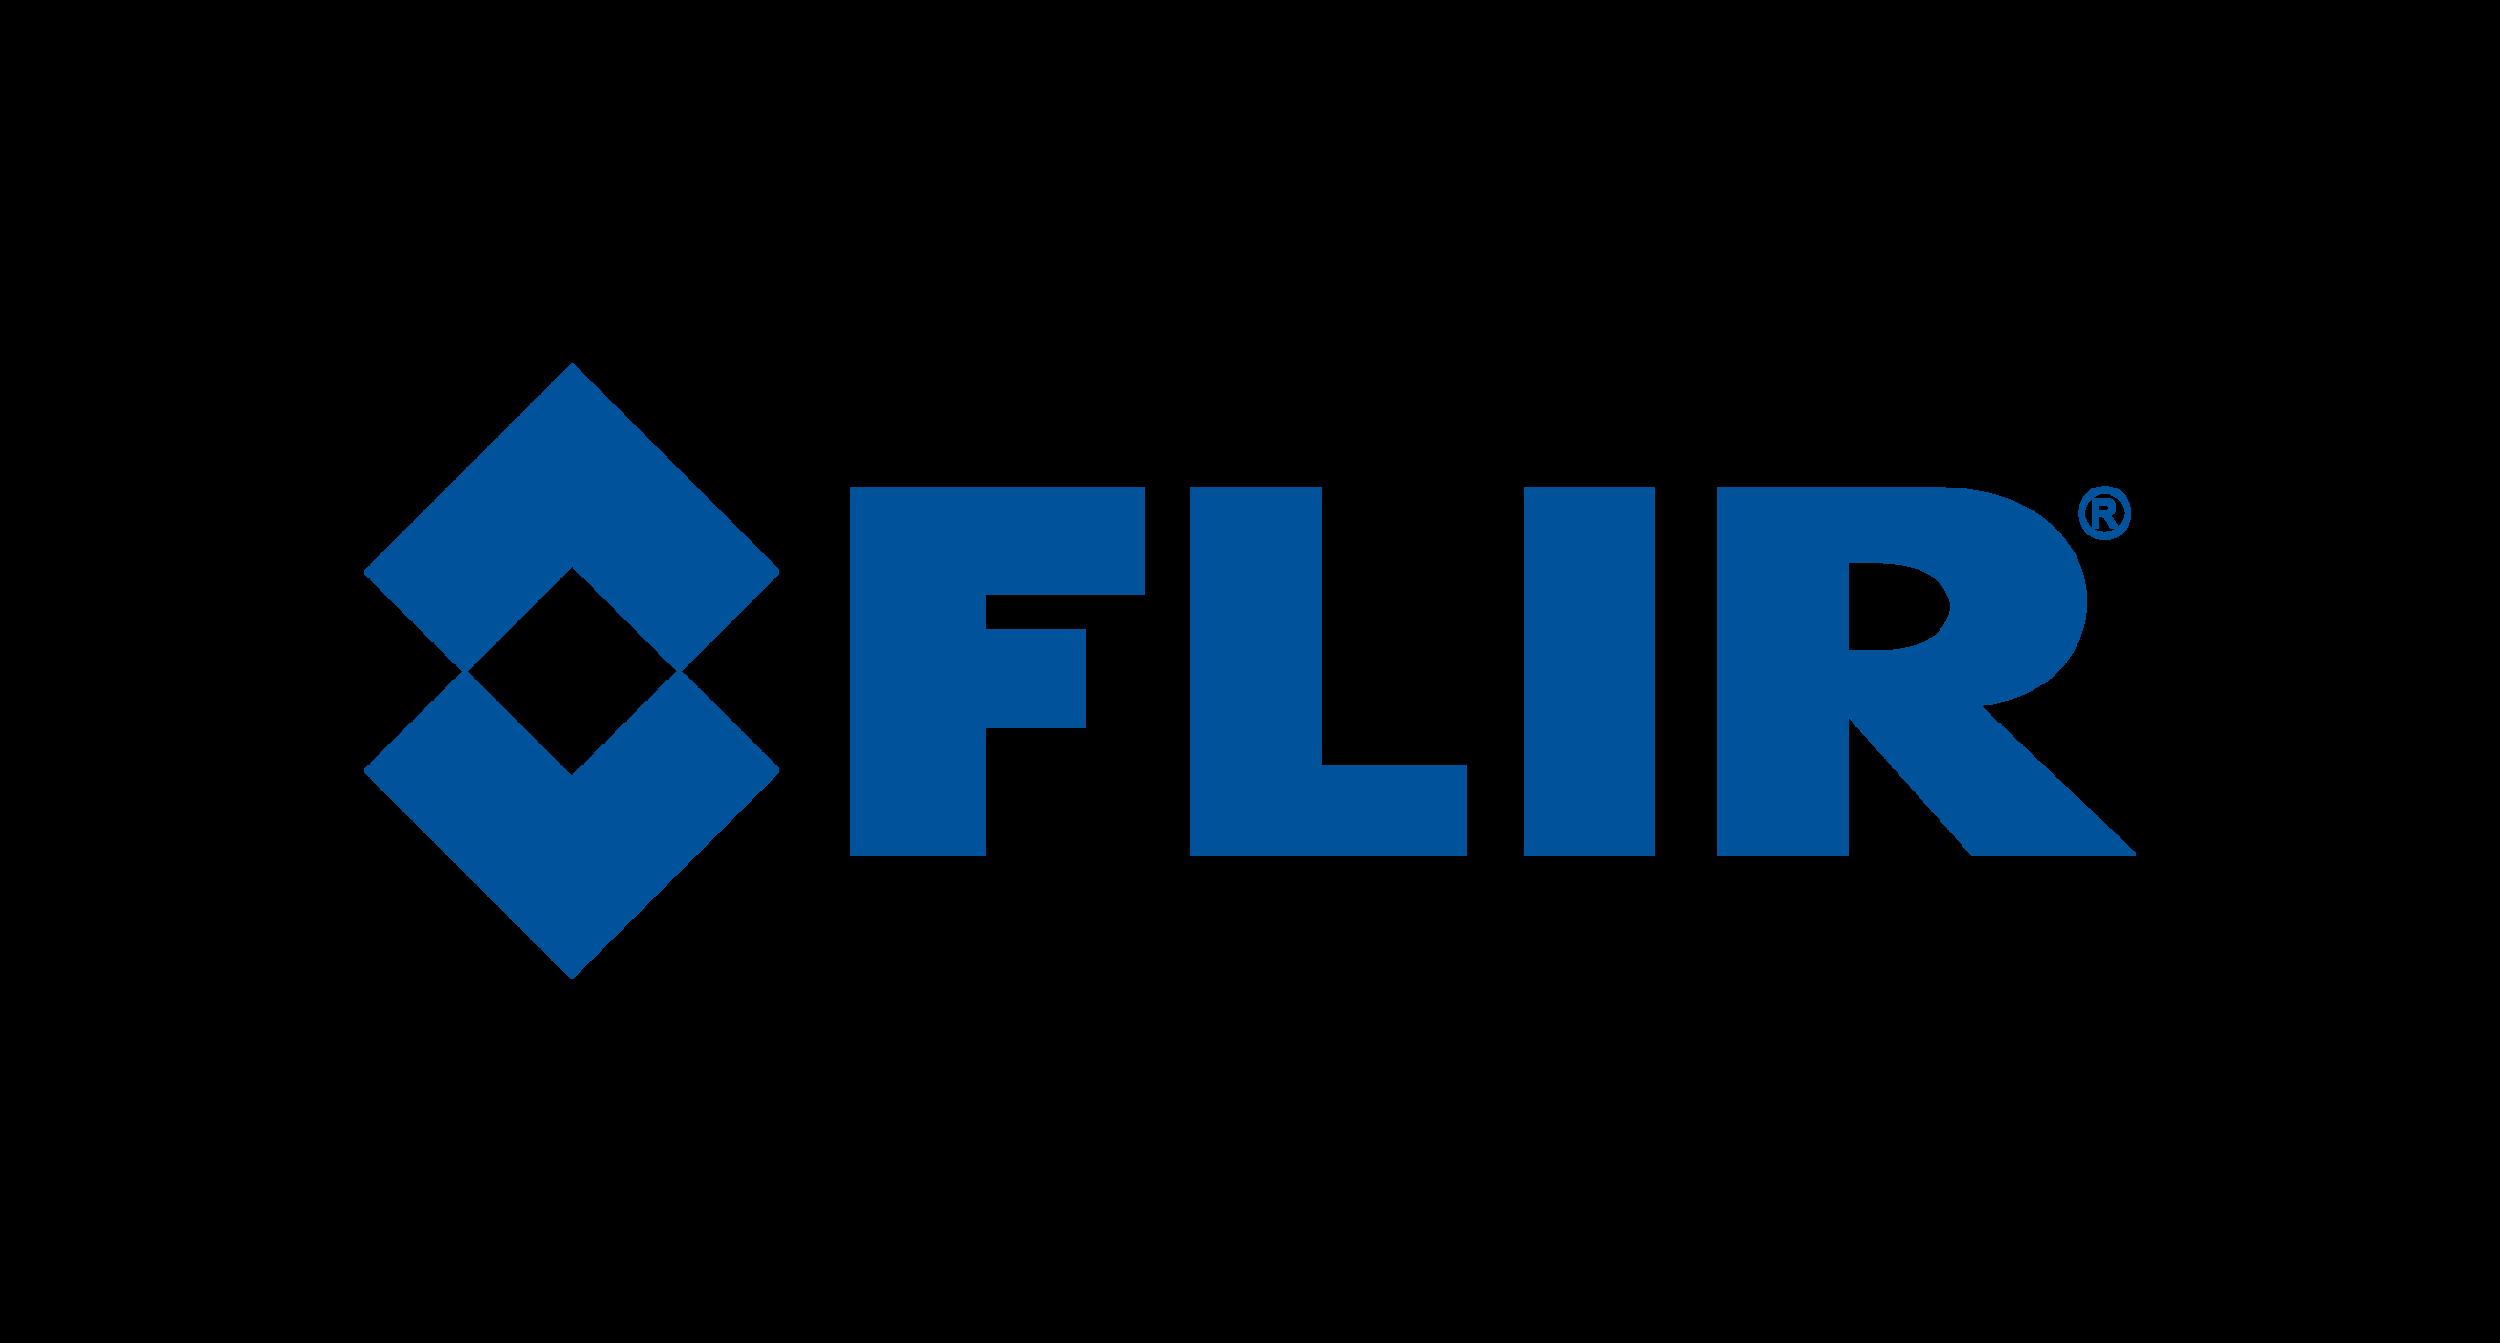 flir_logo_blue.png